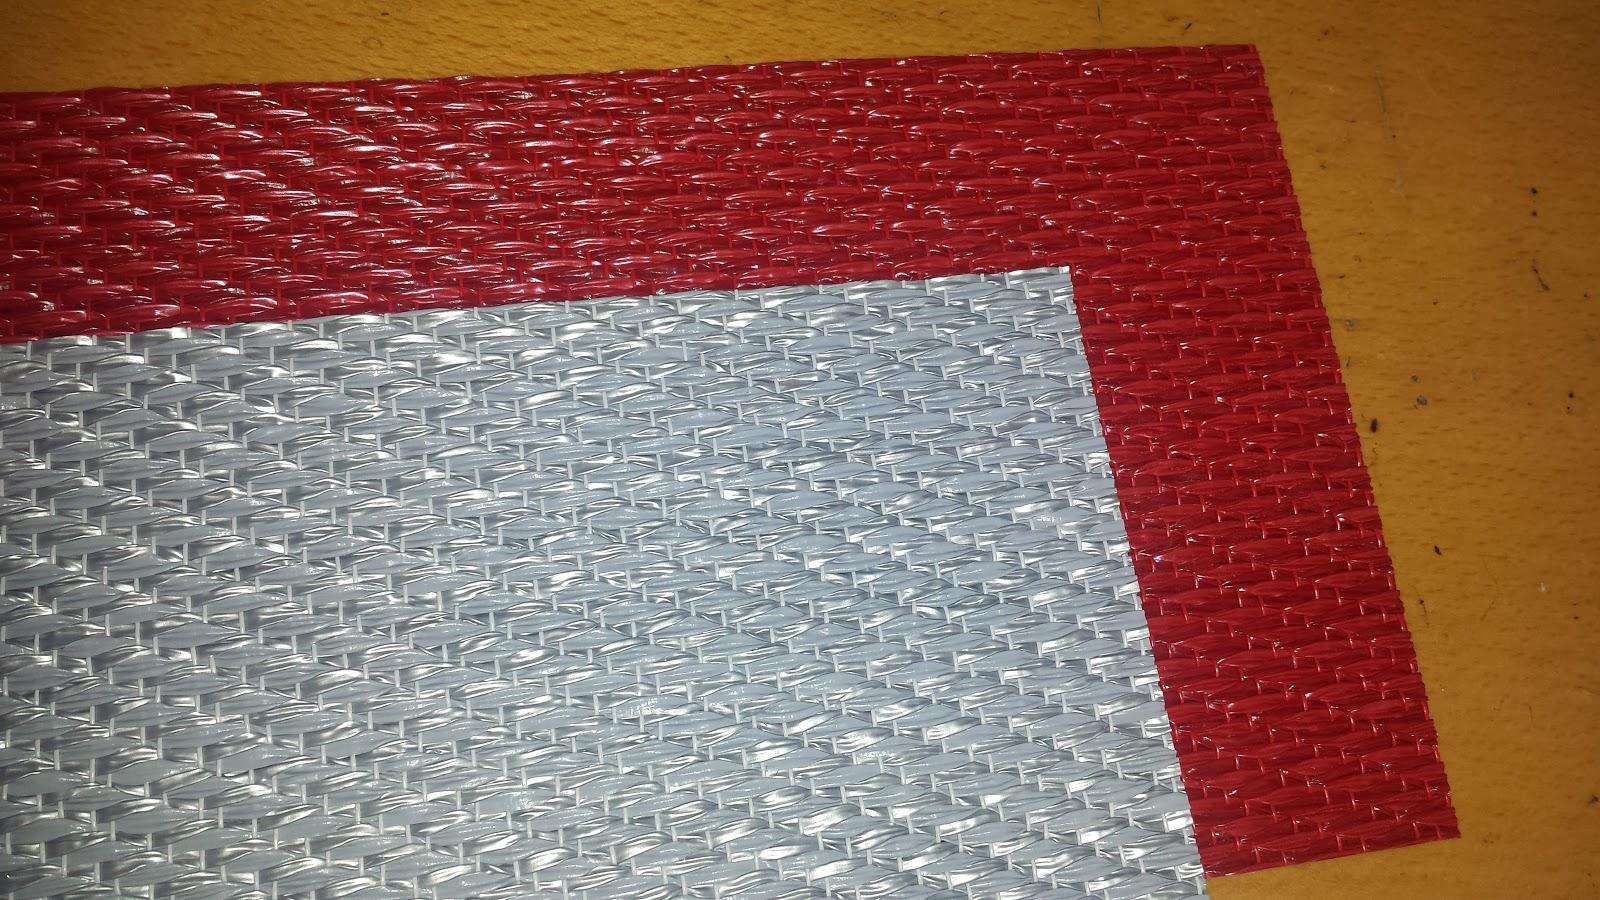 Deco hogar galdakao alfombras de vinilo fregables for Alfombras de vinilo online